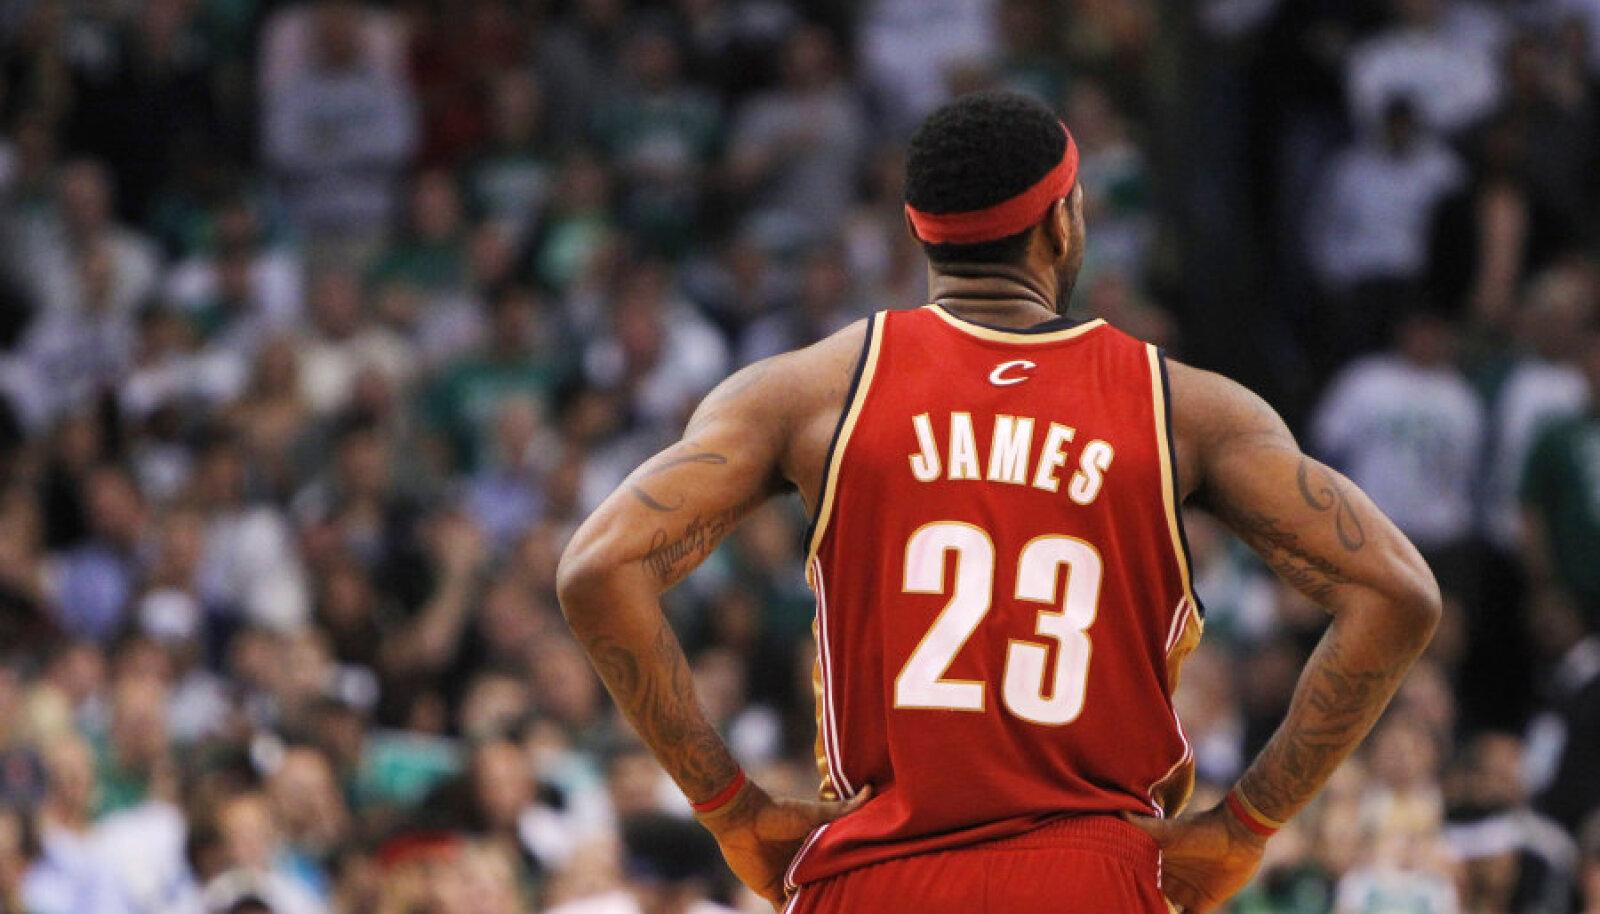 Cavaliers legend James